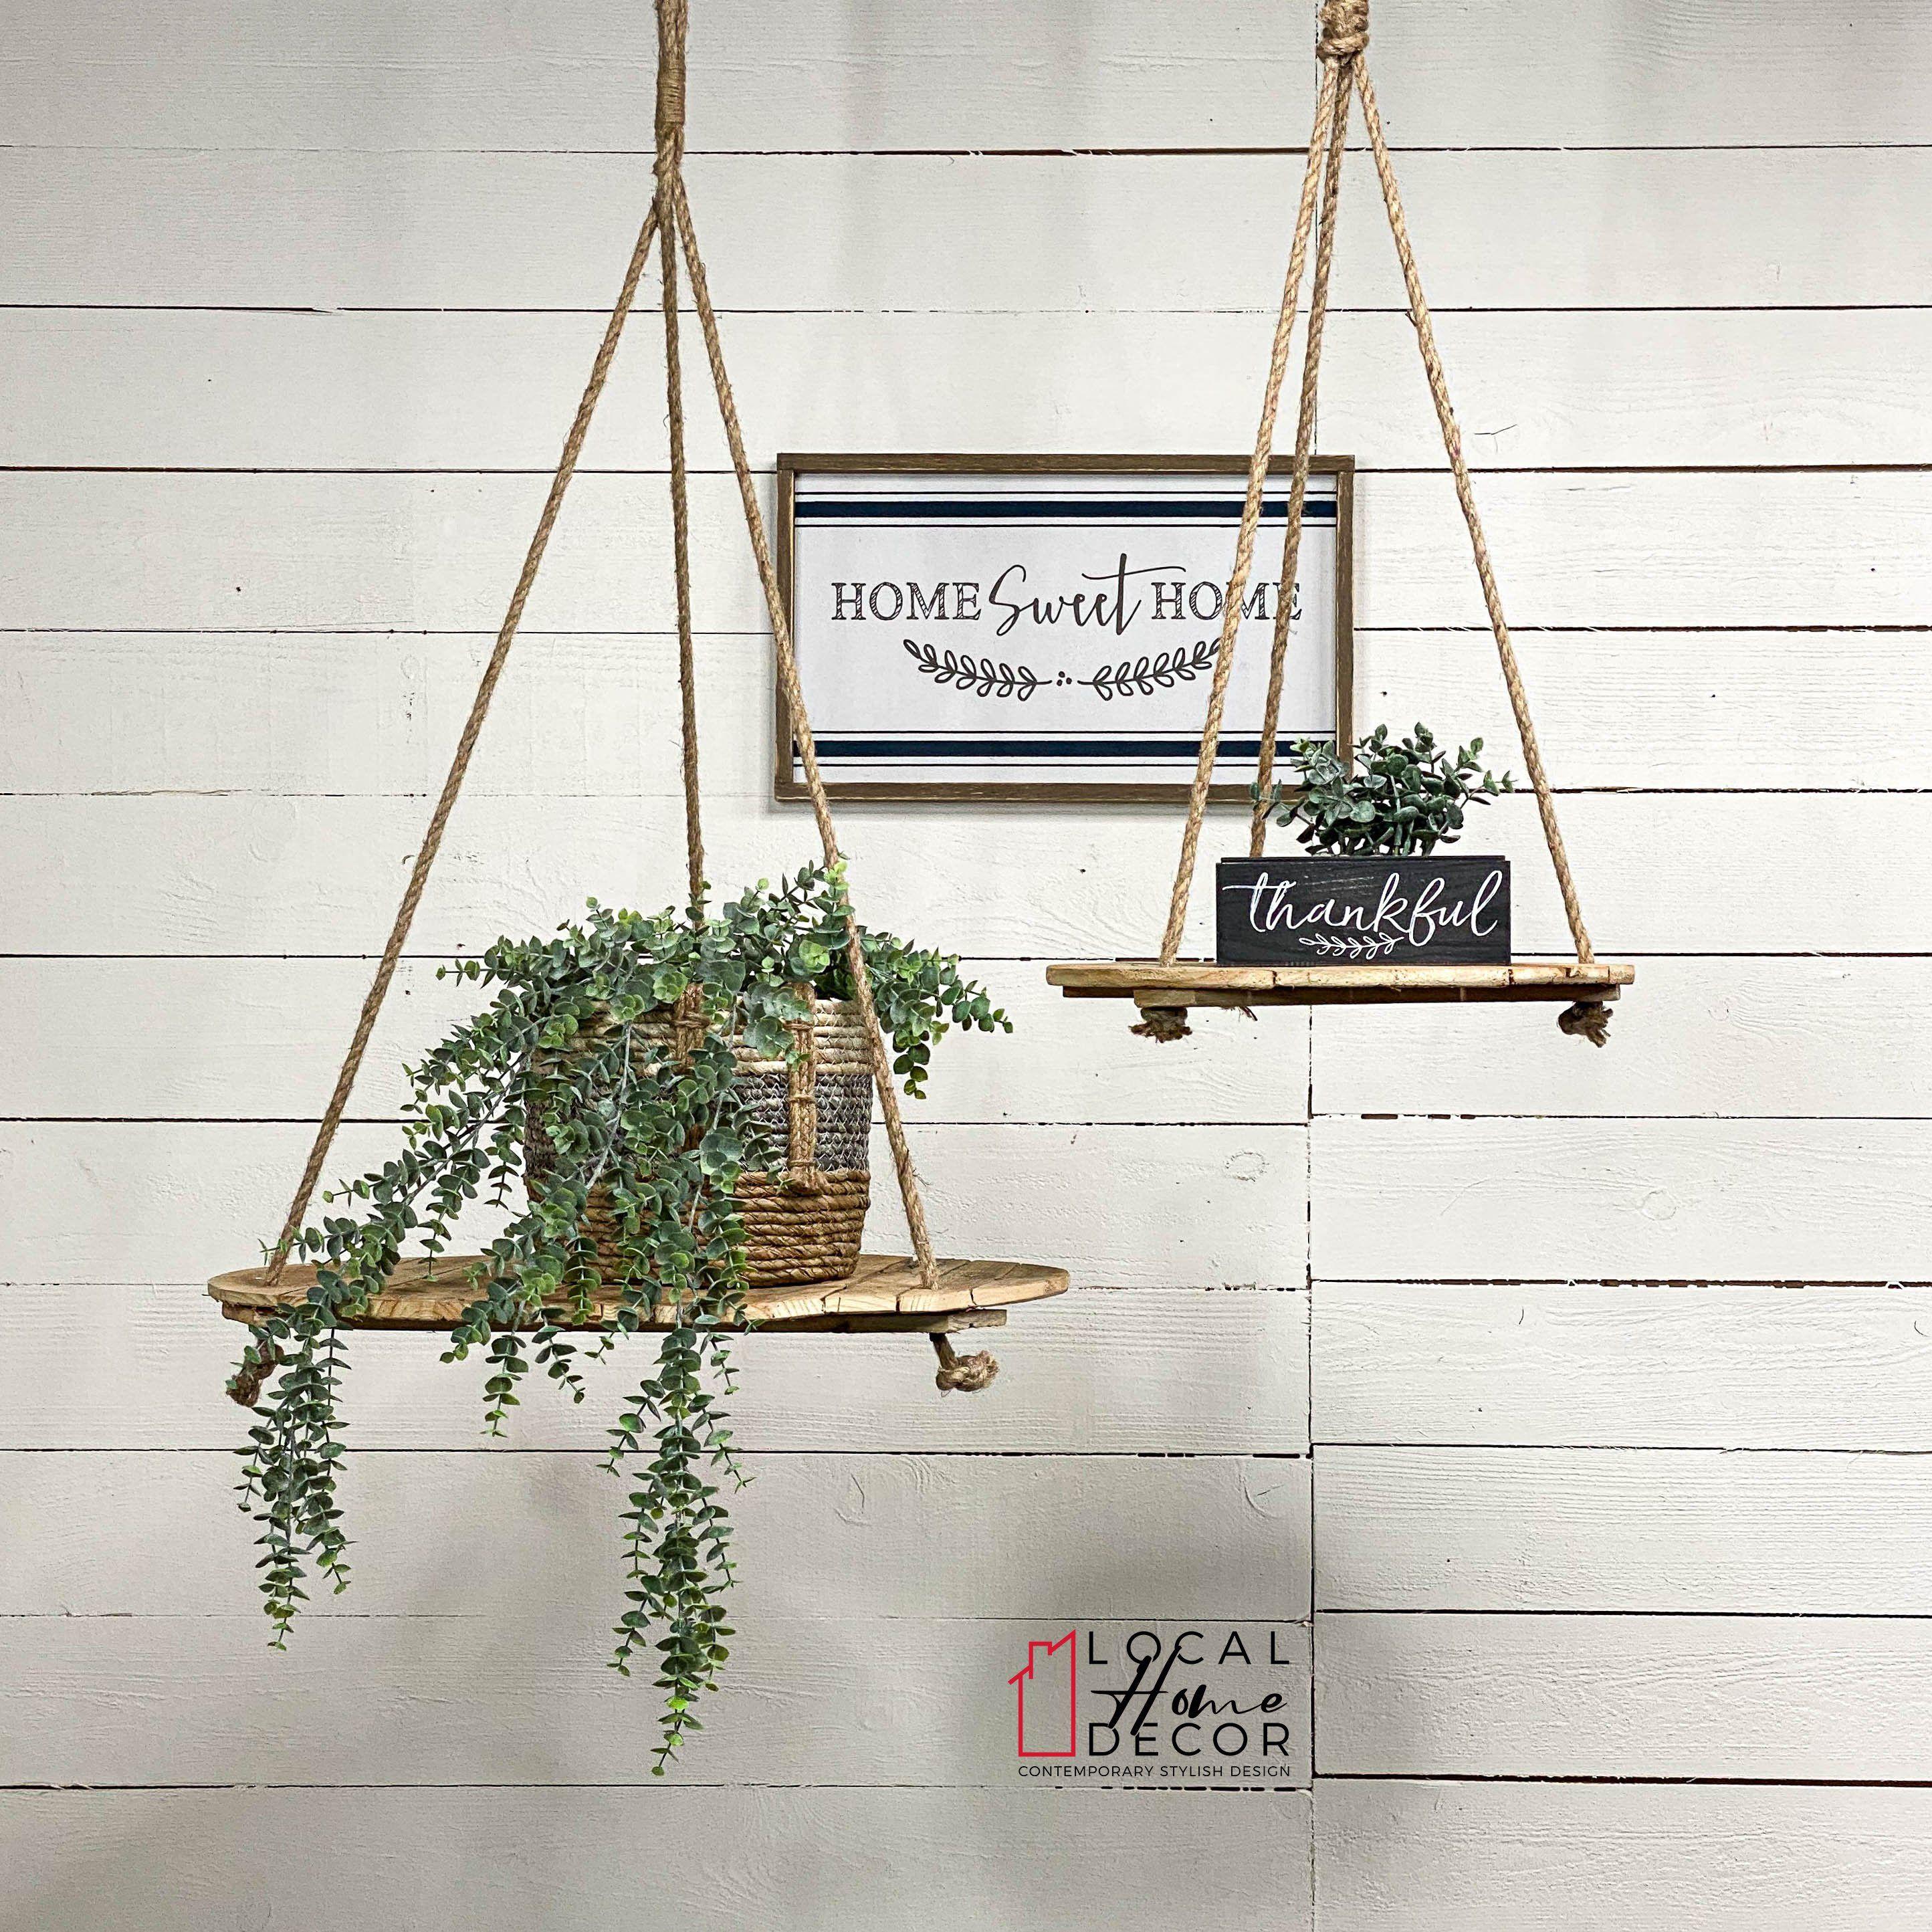 2 Repurposed Wood With Rope Hangers